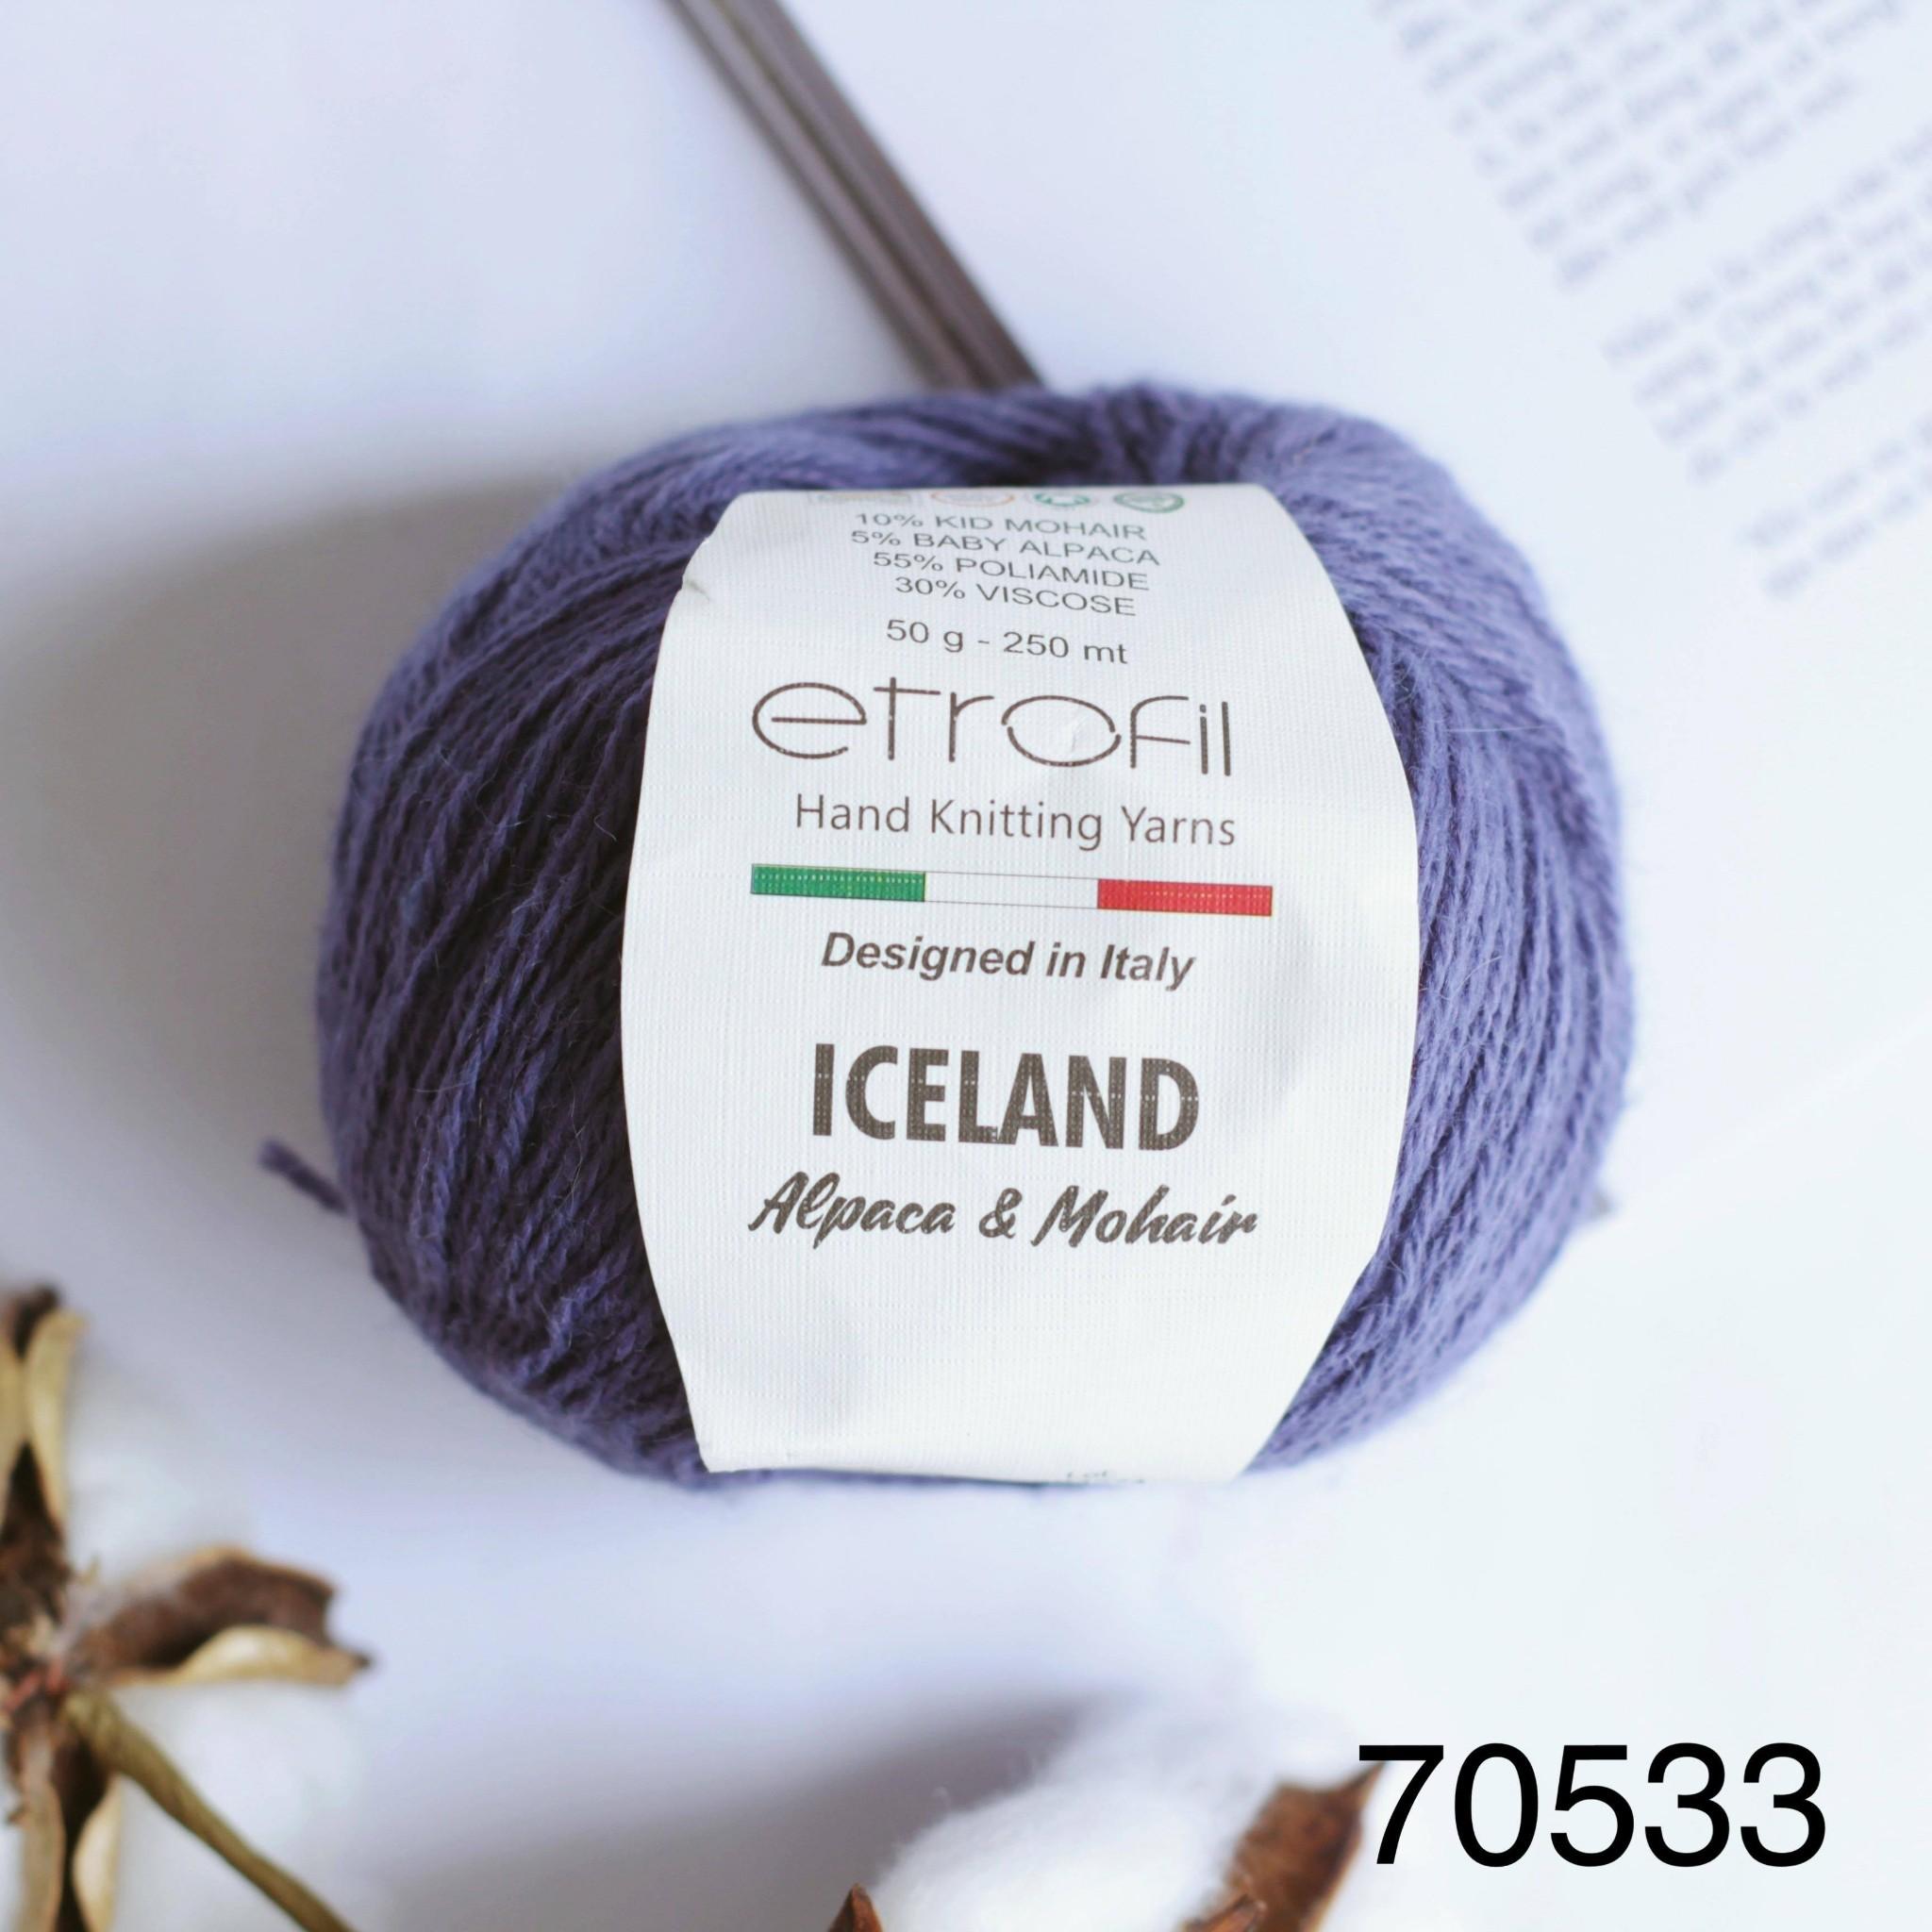 Etrofil Iceland